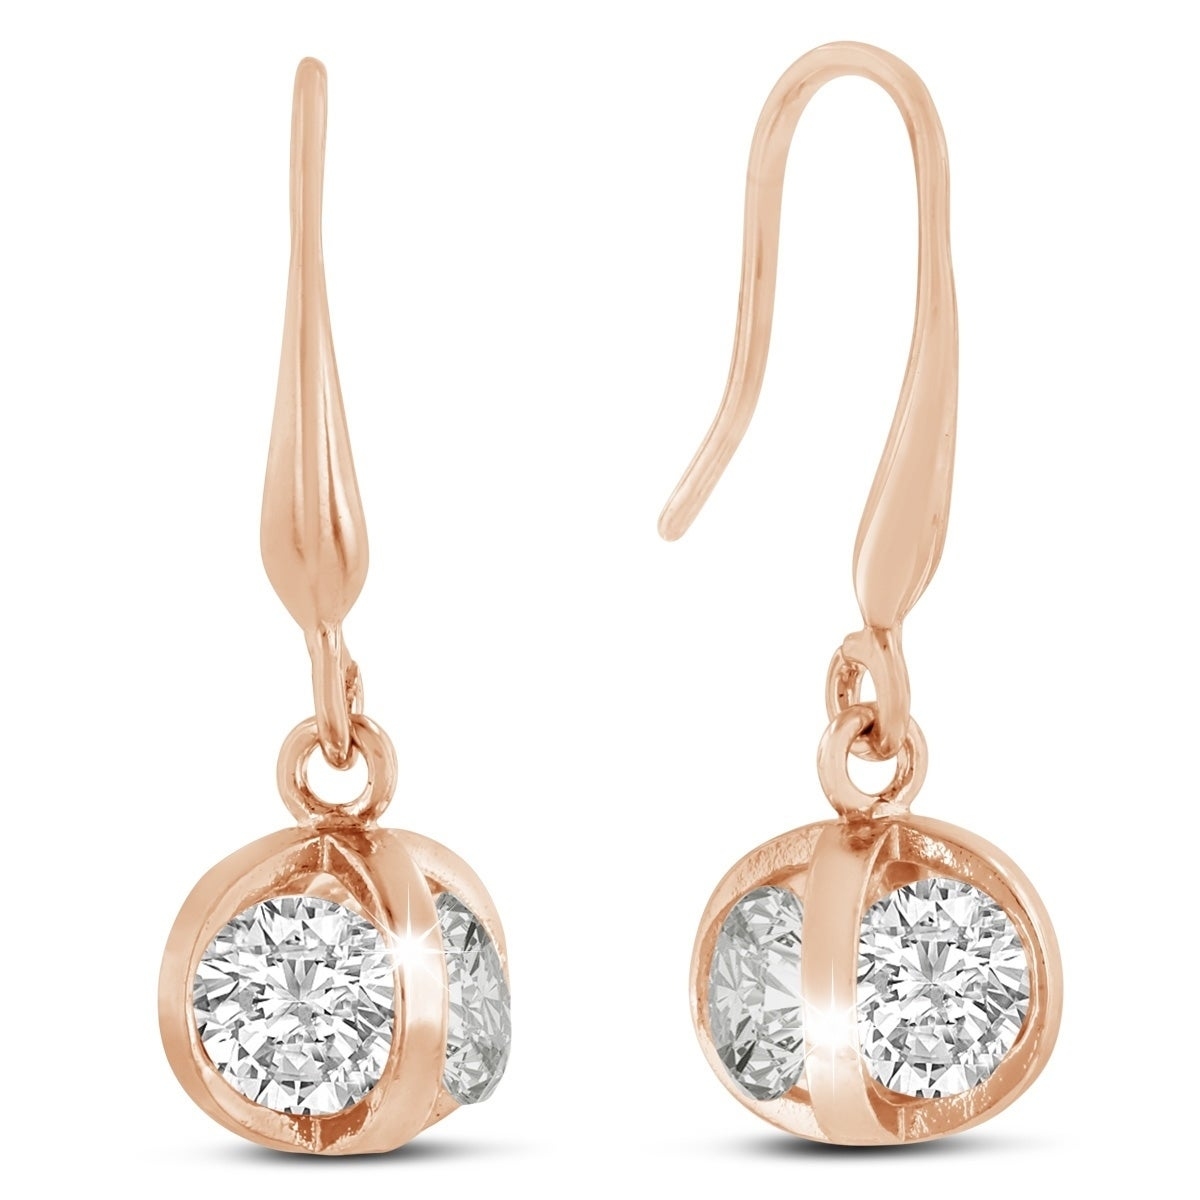 Swarovski Elements Crystal Basket Dangle Earrings Rose Gold Overlay 1 Inch